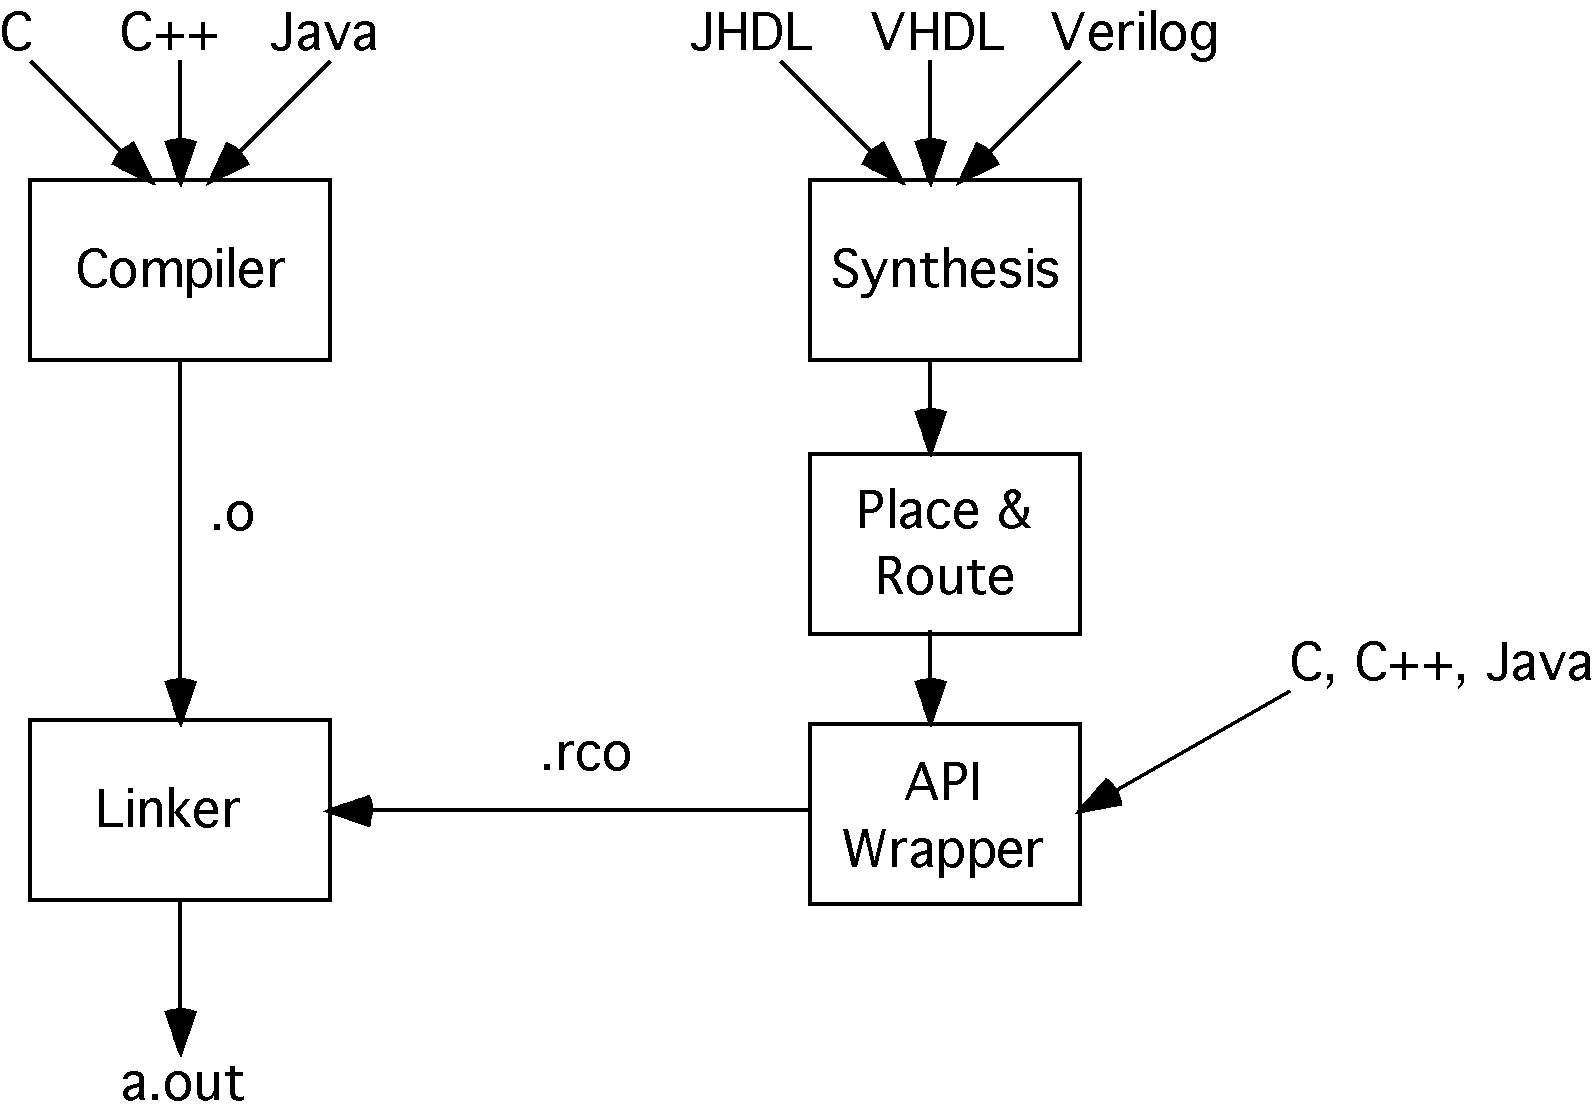 Hardware parallelism vs. software parallelism